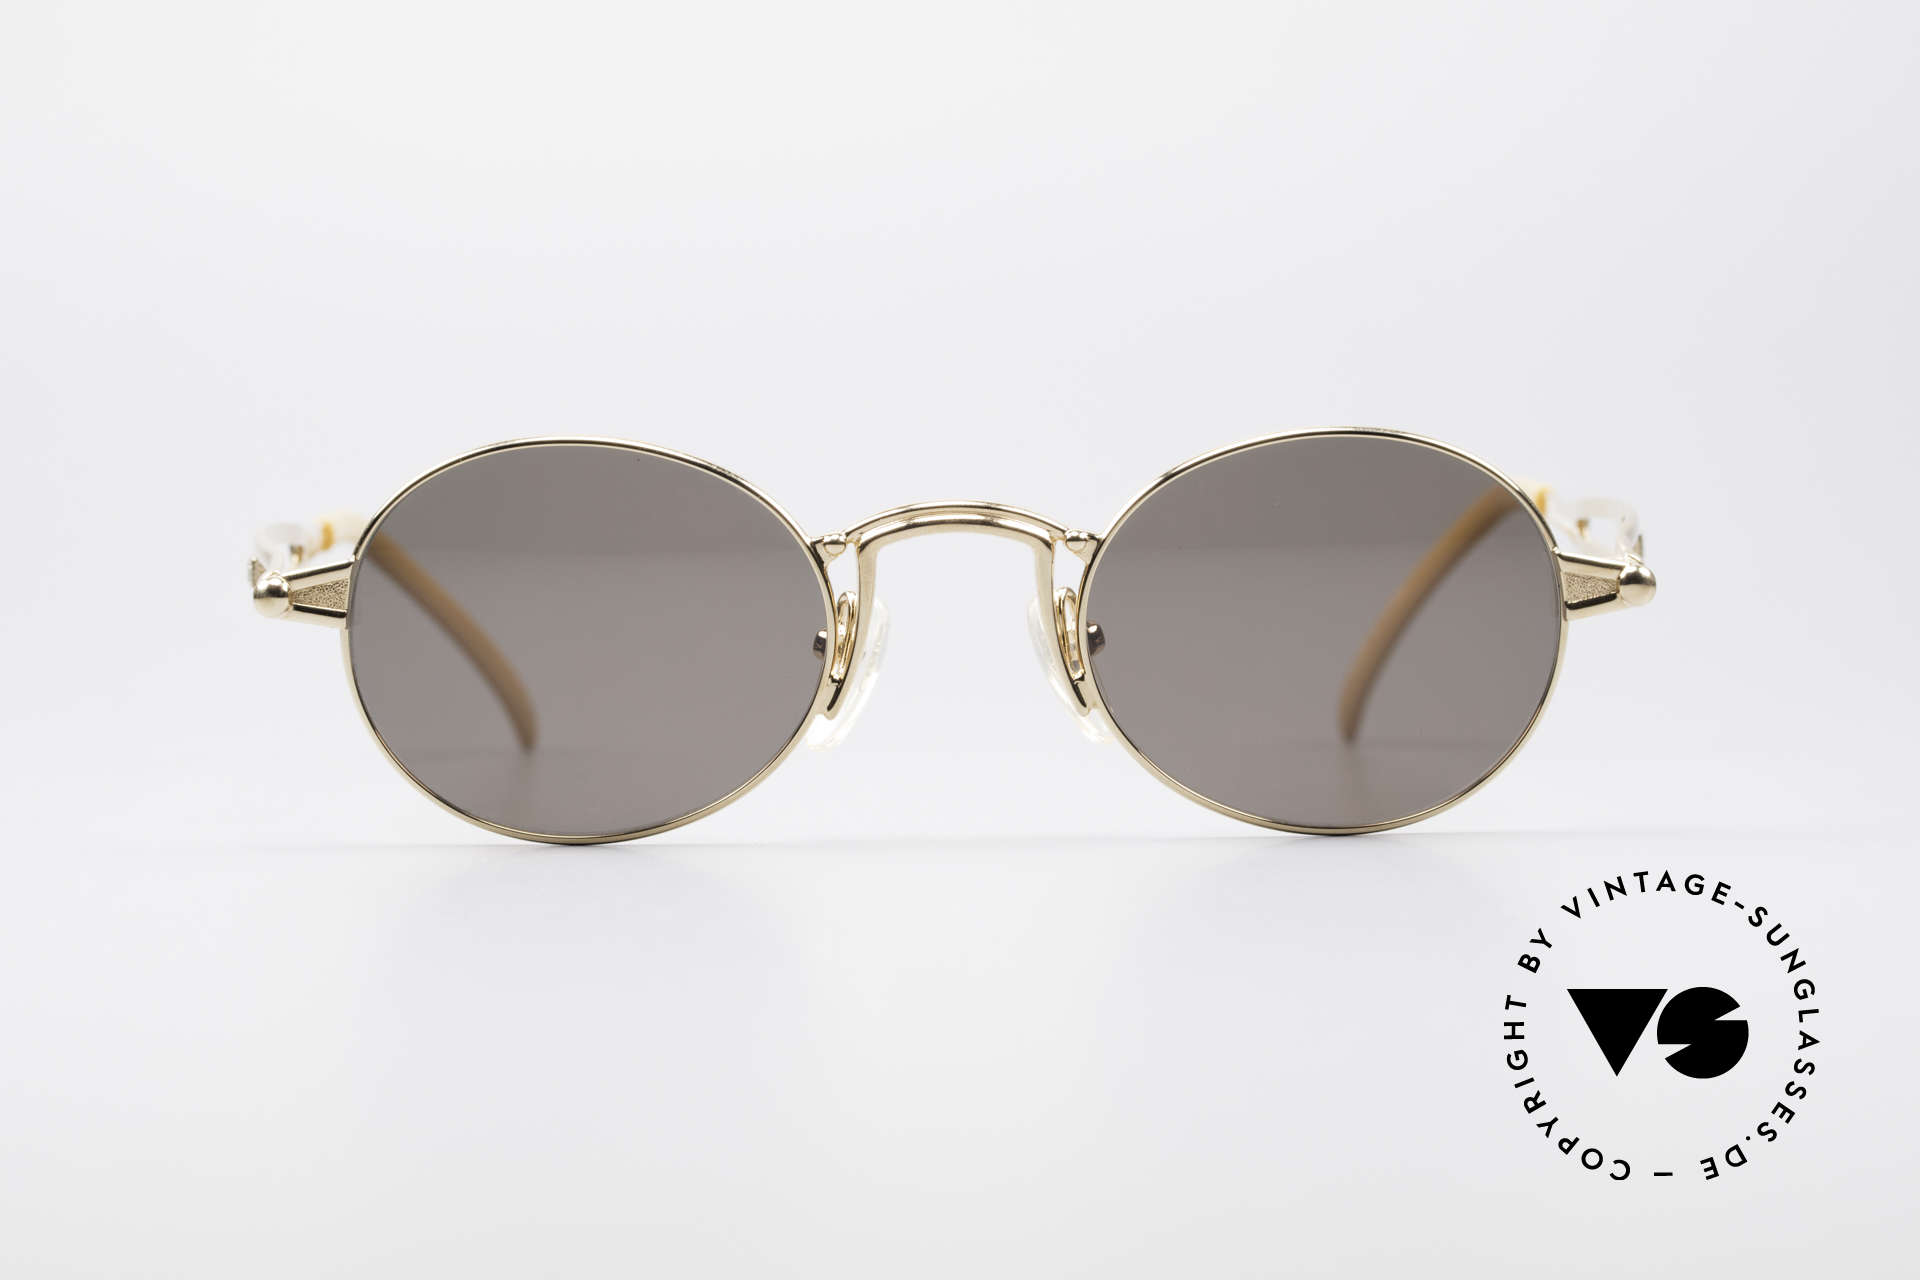 1698fbbcd Sunglasses Jean Paul Gaultier 56-7108 Gold-Plated Oval Sunglasses ...